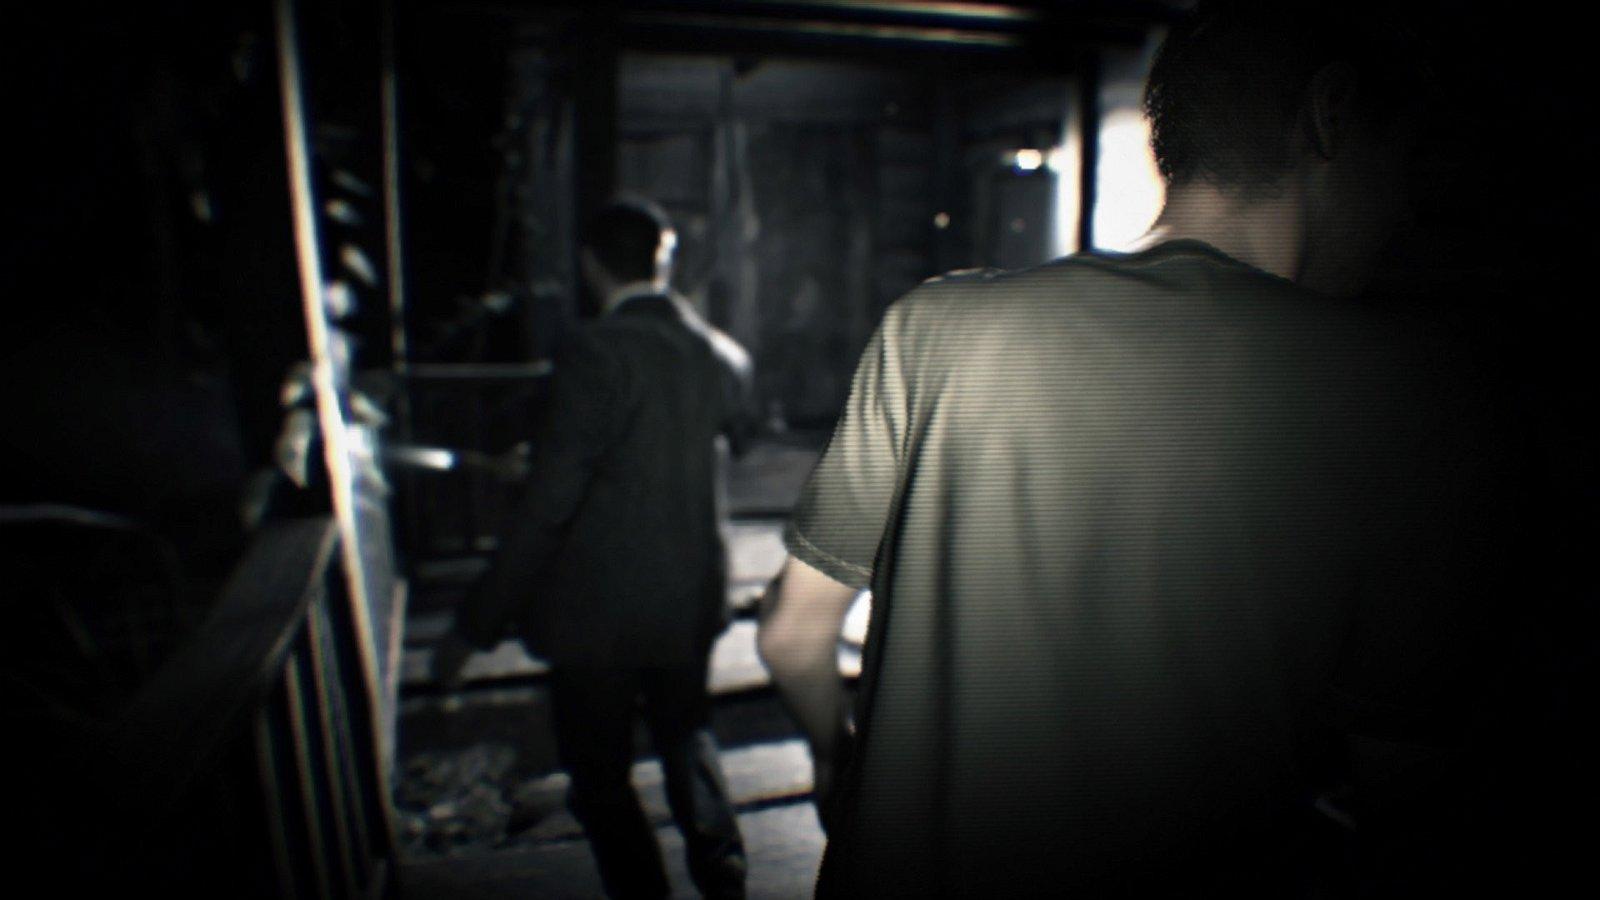 Resident Evil 7 ofrecerá un DLC gratuito la próxima primavera